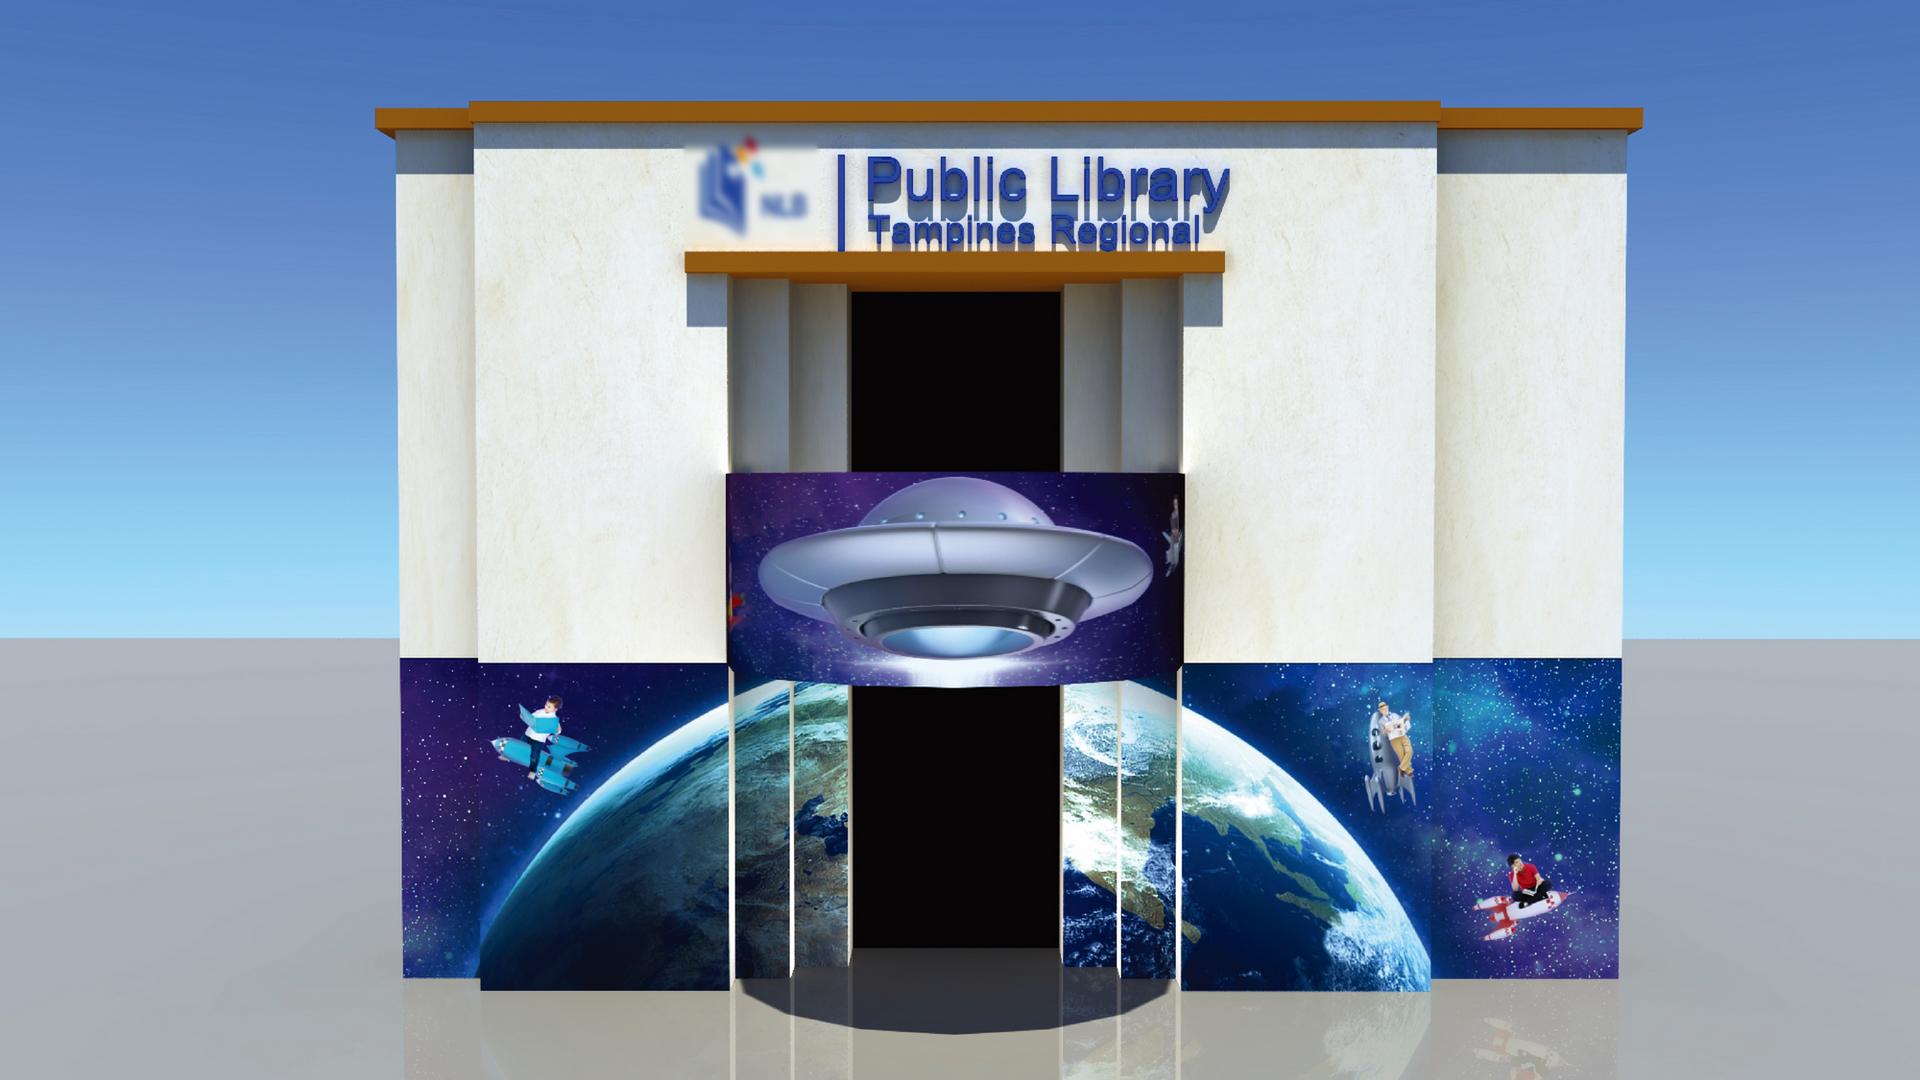 Tampines Regional Library Creative Wall Mural 1